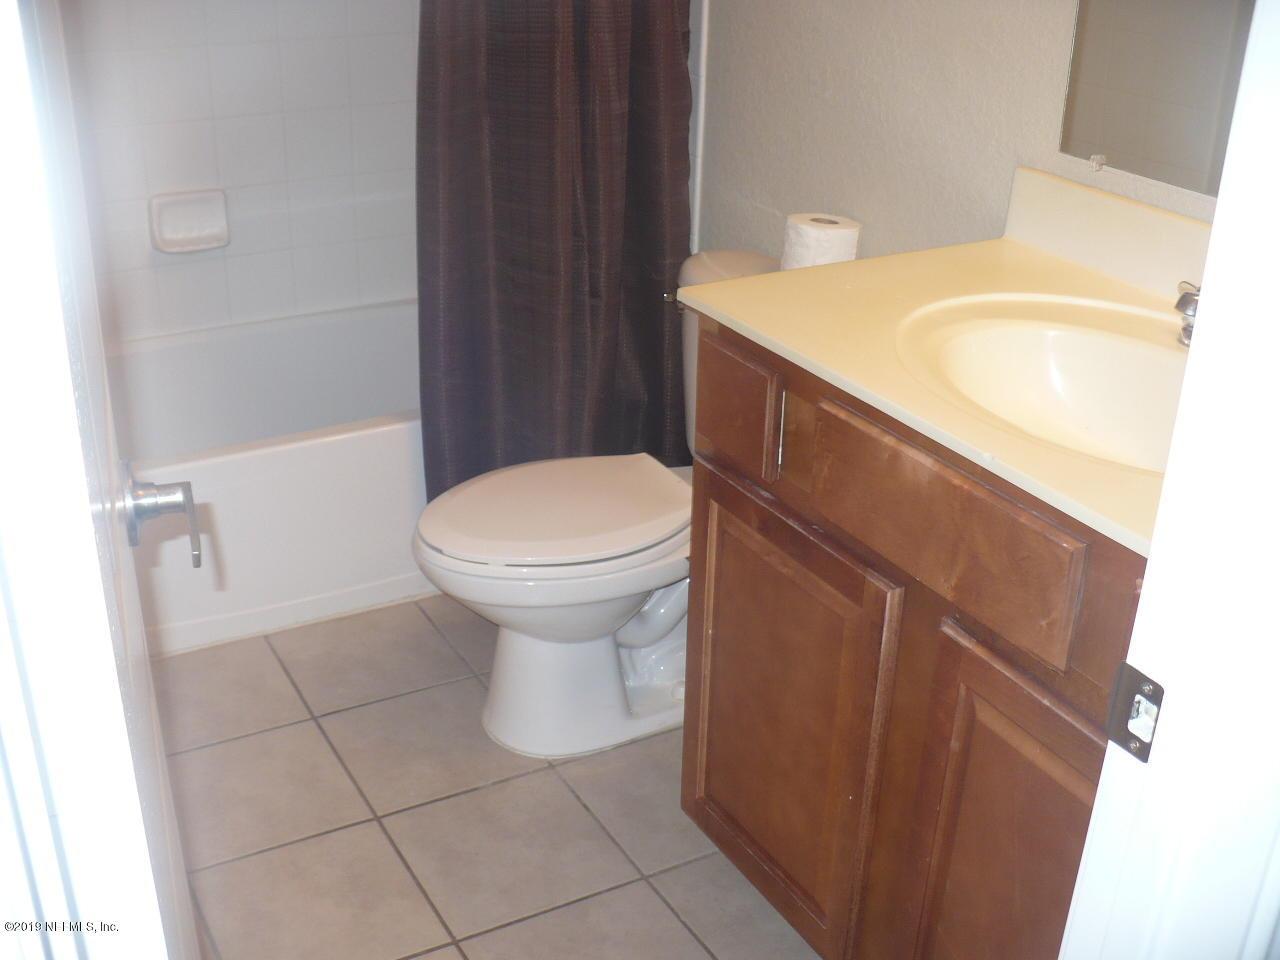 10200 BELLE RIVE, JACKSONVILLE, FLORIDA 32256, 2 Bedrooms Bedrooms, ,Condo,For sale,BELLE RIVE,1006932